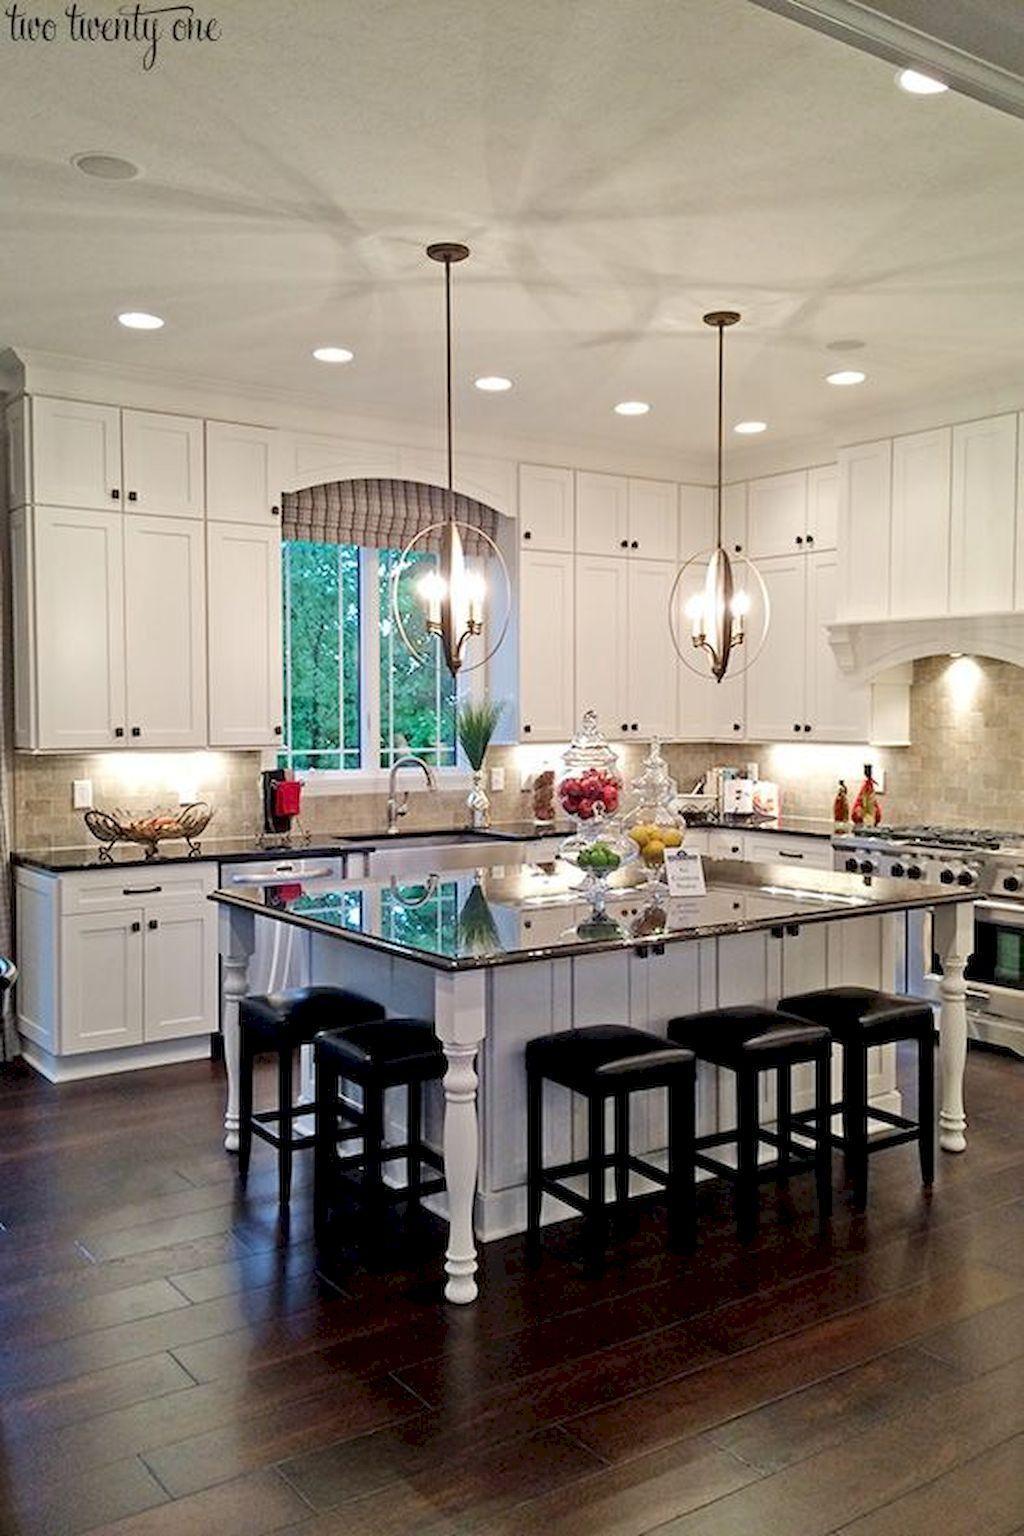 great ideas for kitchen islands 20 kitchen remodel kitchen design kitchen island with seating on kitchen island ideas kids id=80320